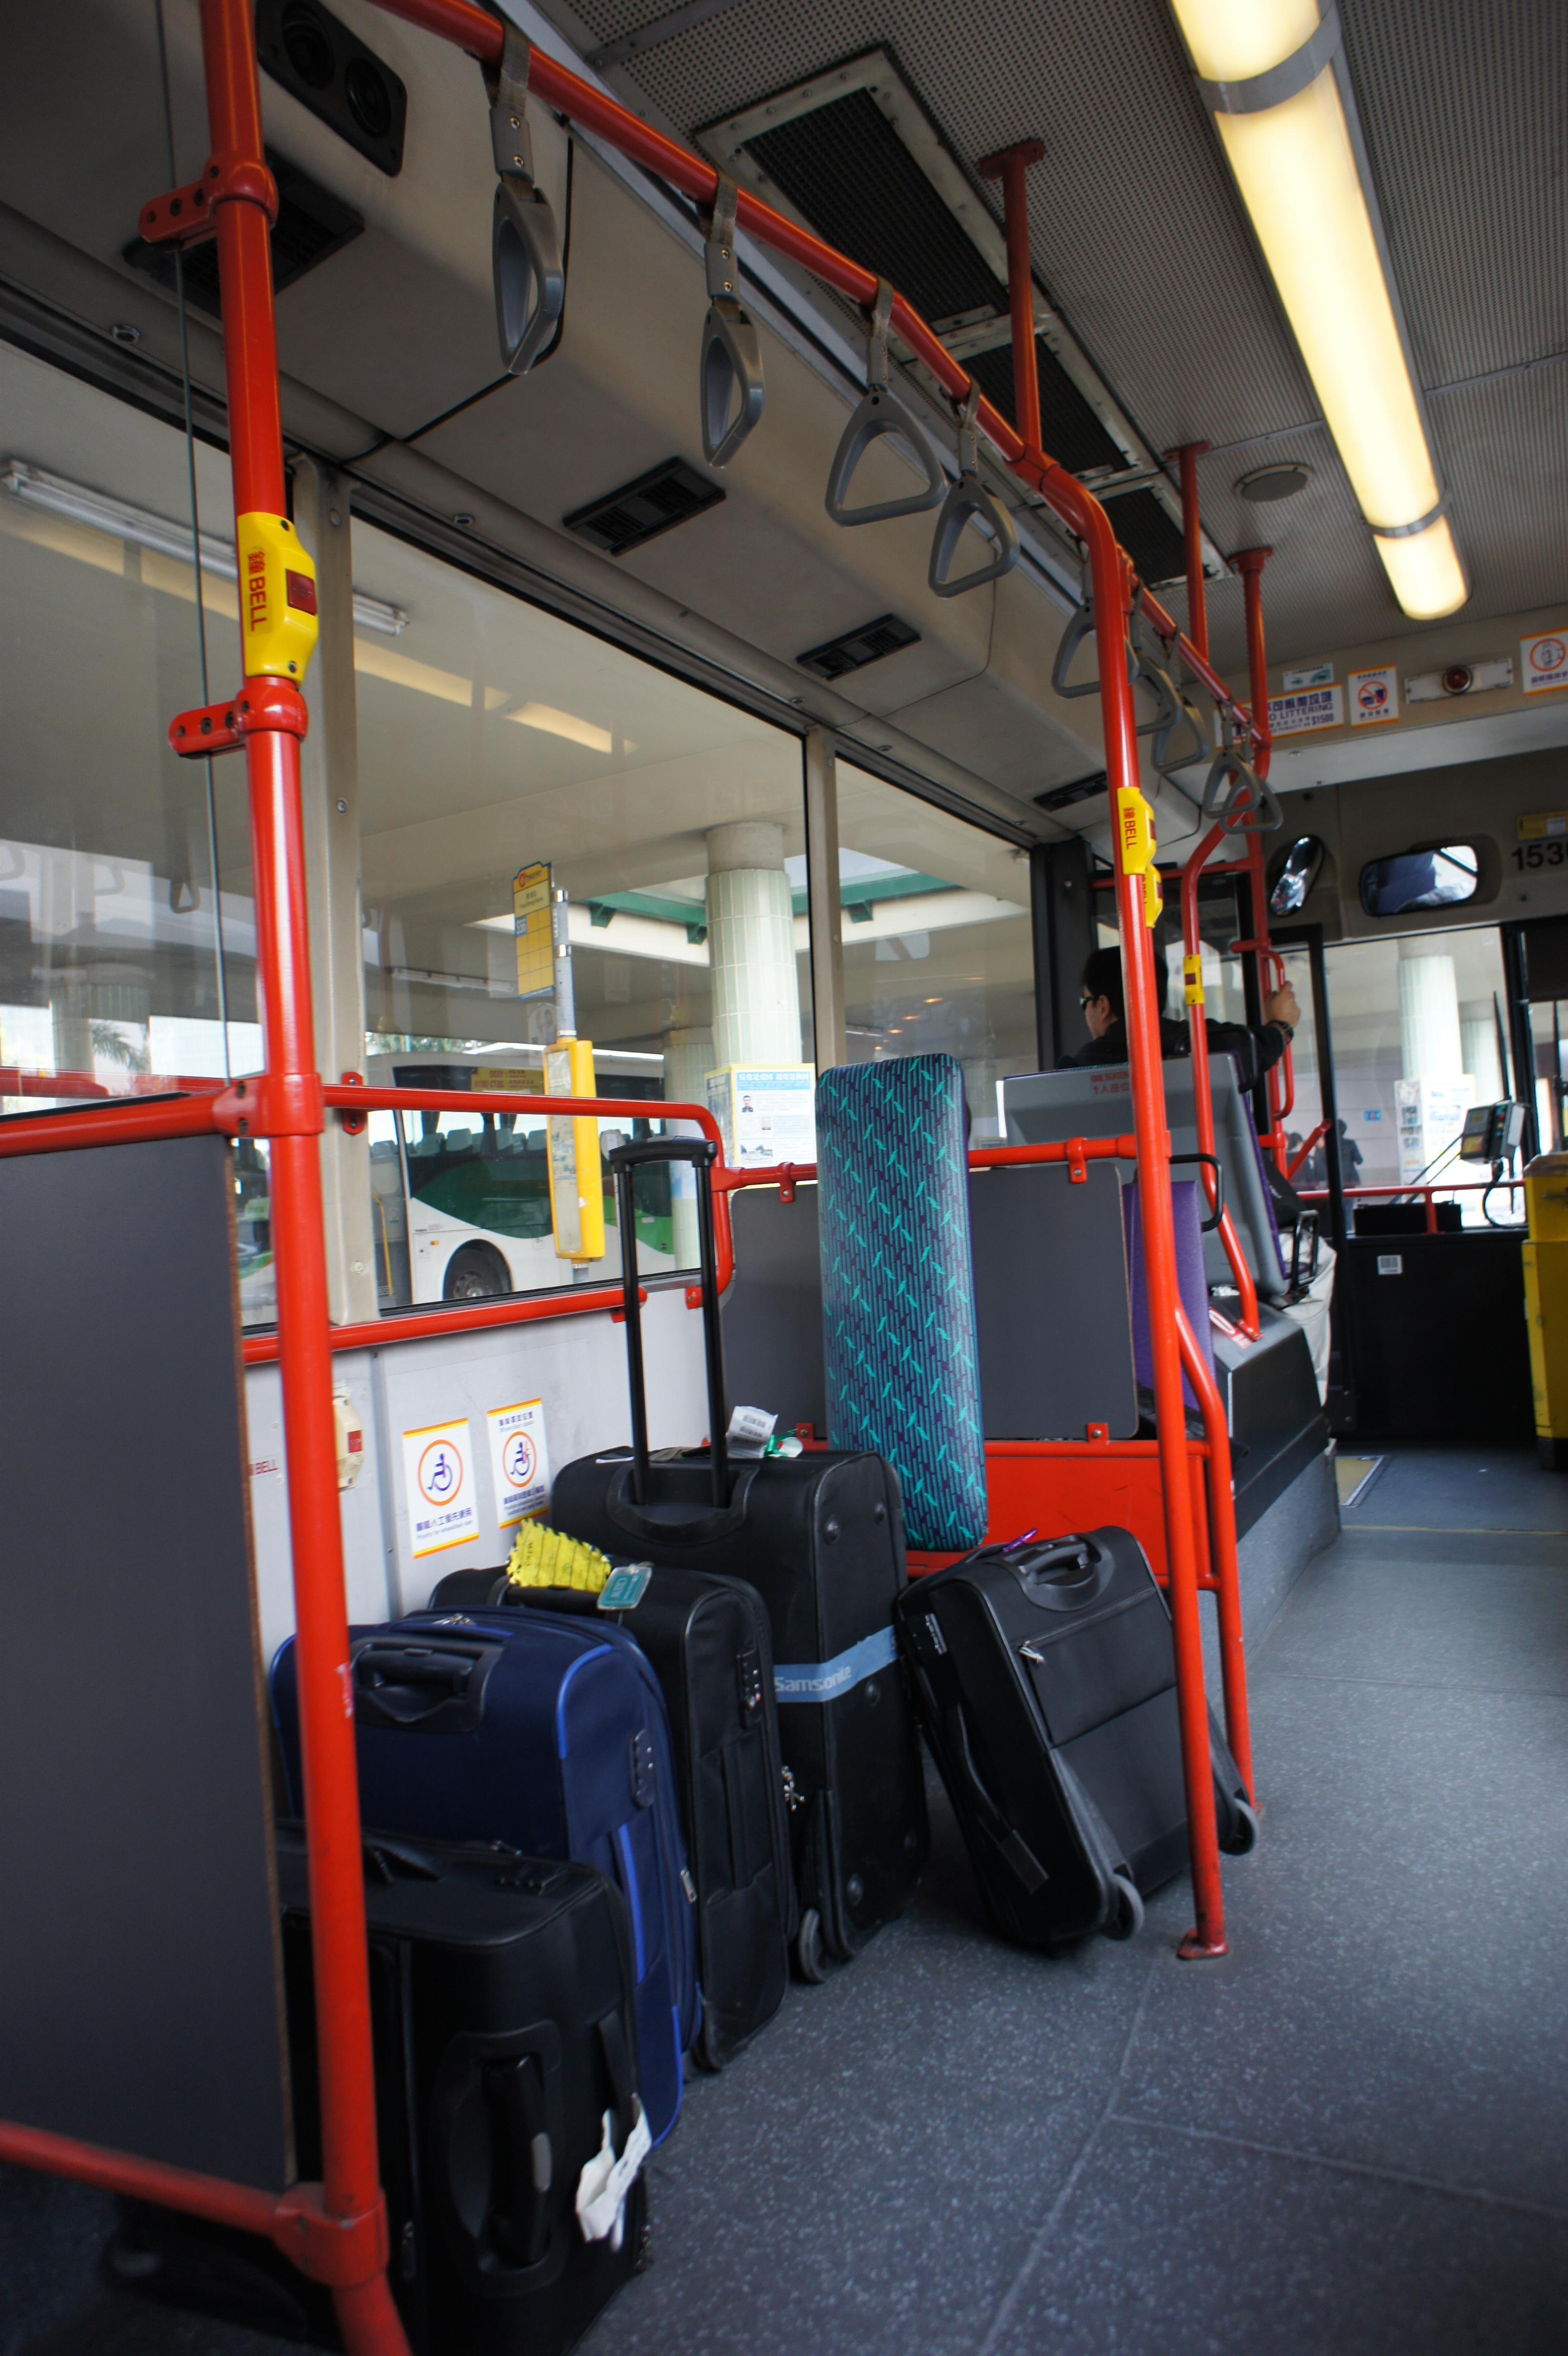 File:Hong Kong Citybus route S56 luggage rack JPG